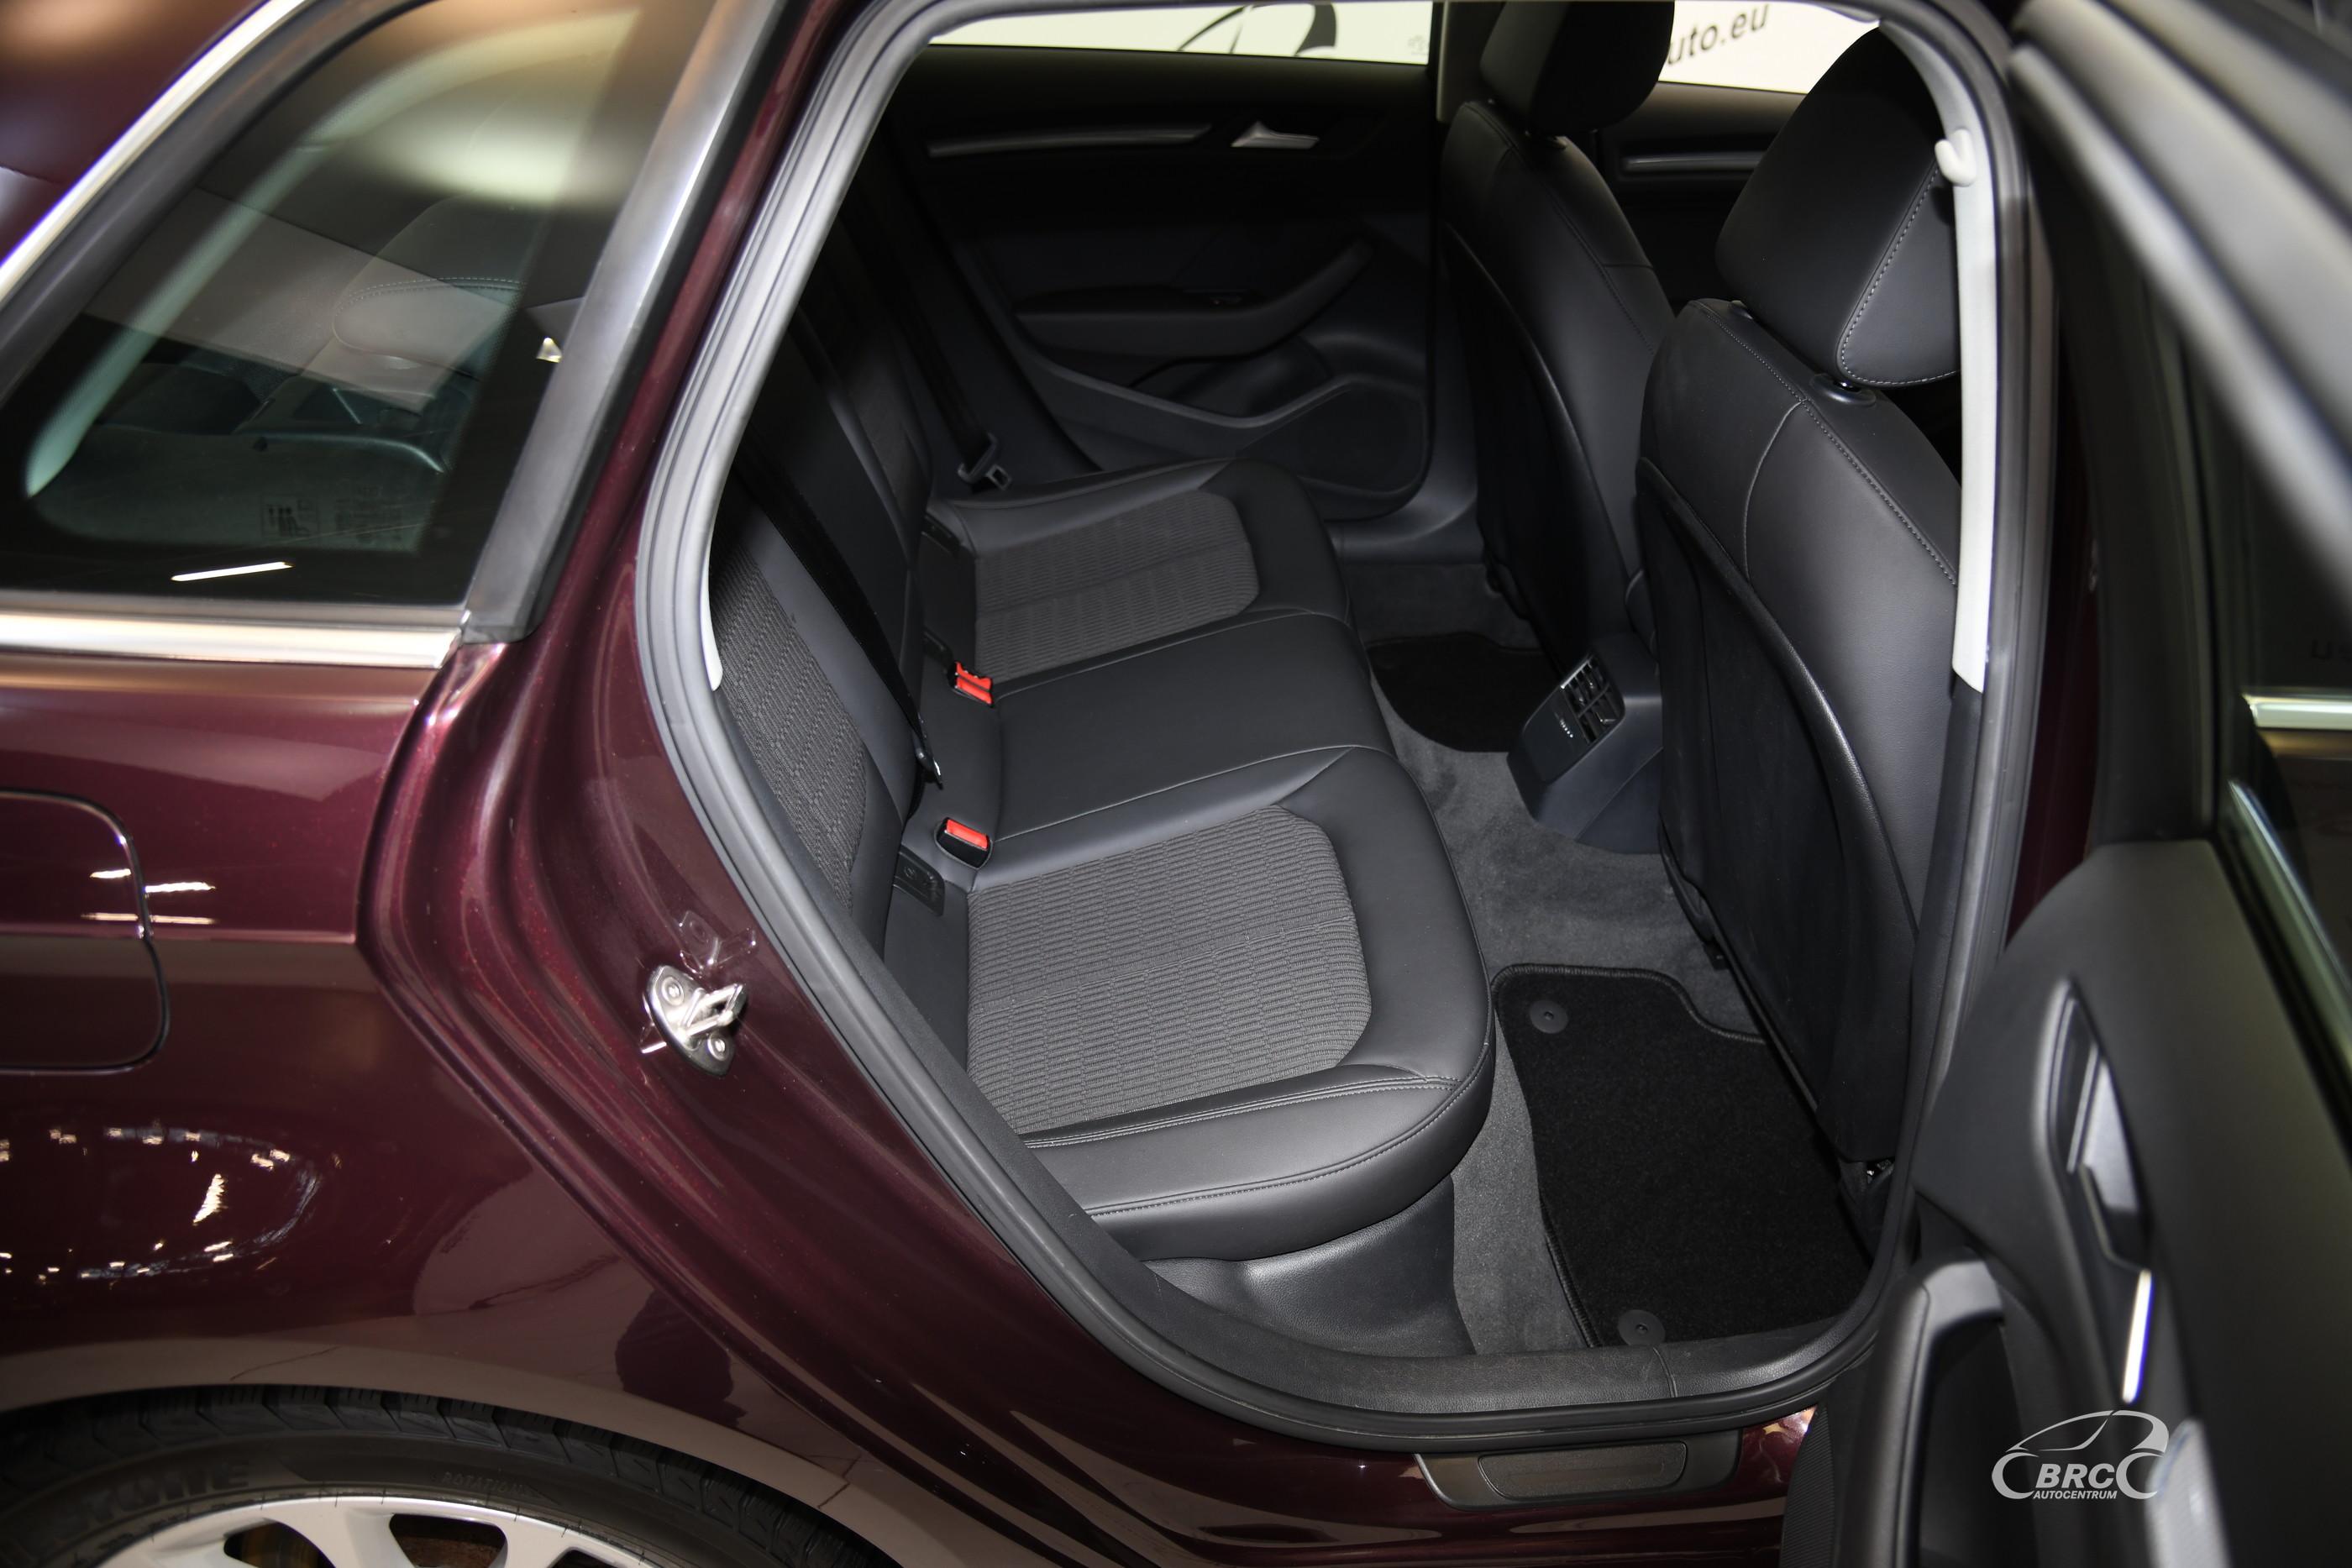 Audi A3 1.4 TFSI Sportback Automatas